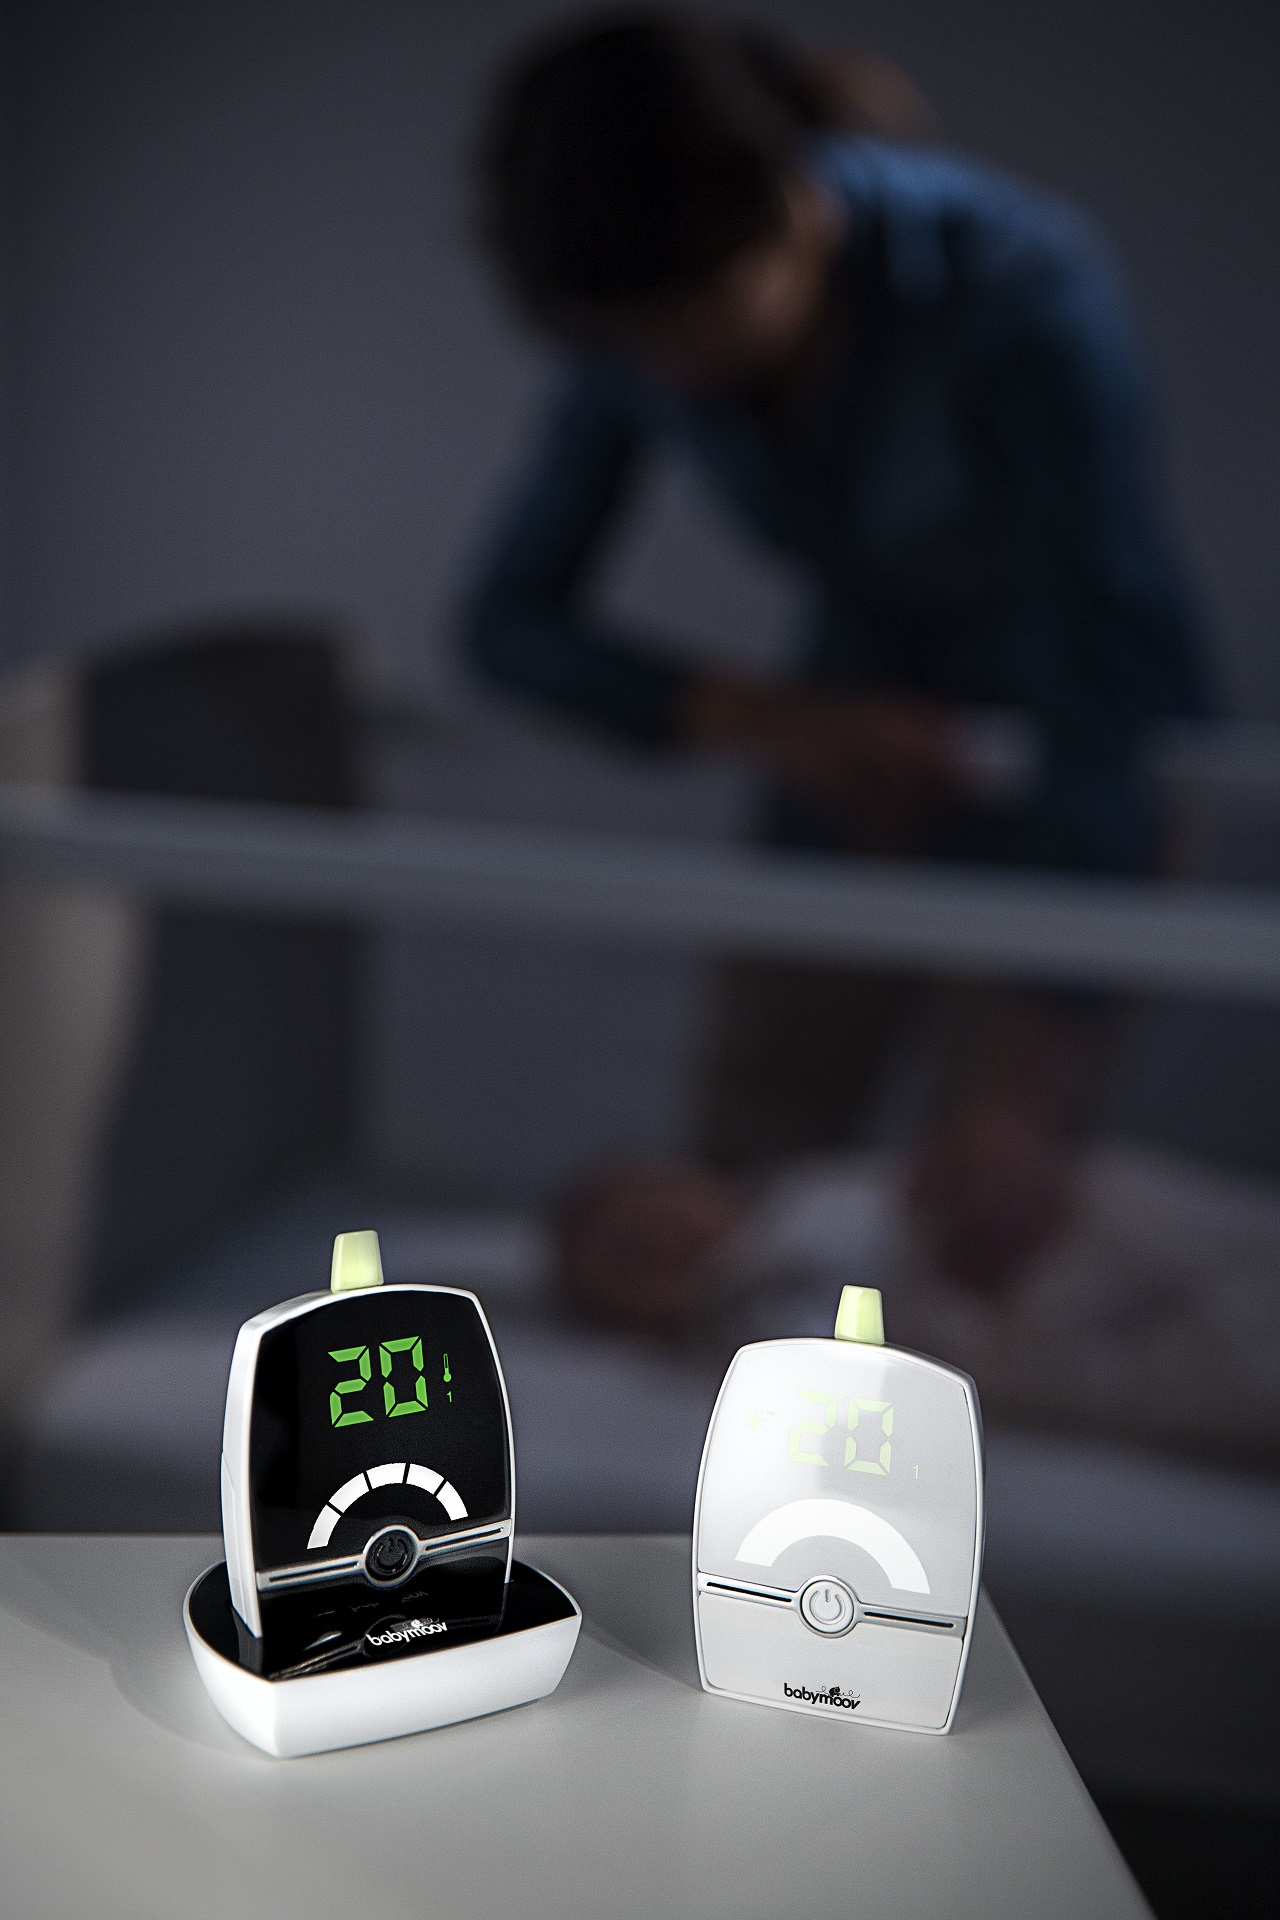 babymoov premium care baby monitor buy at kidsroom living sleeping. Black Bedroom Furniture Sets. Home Design Ideas